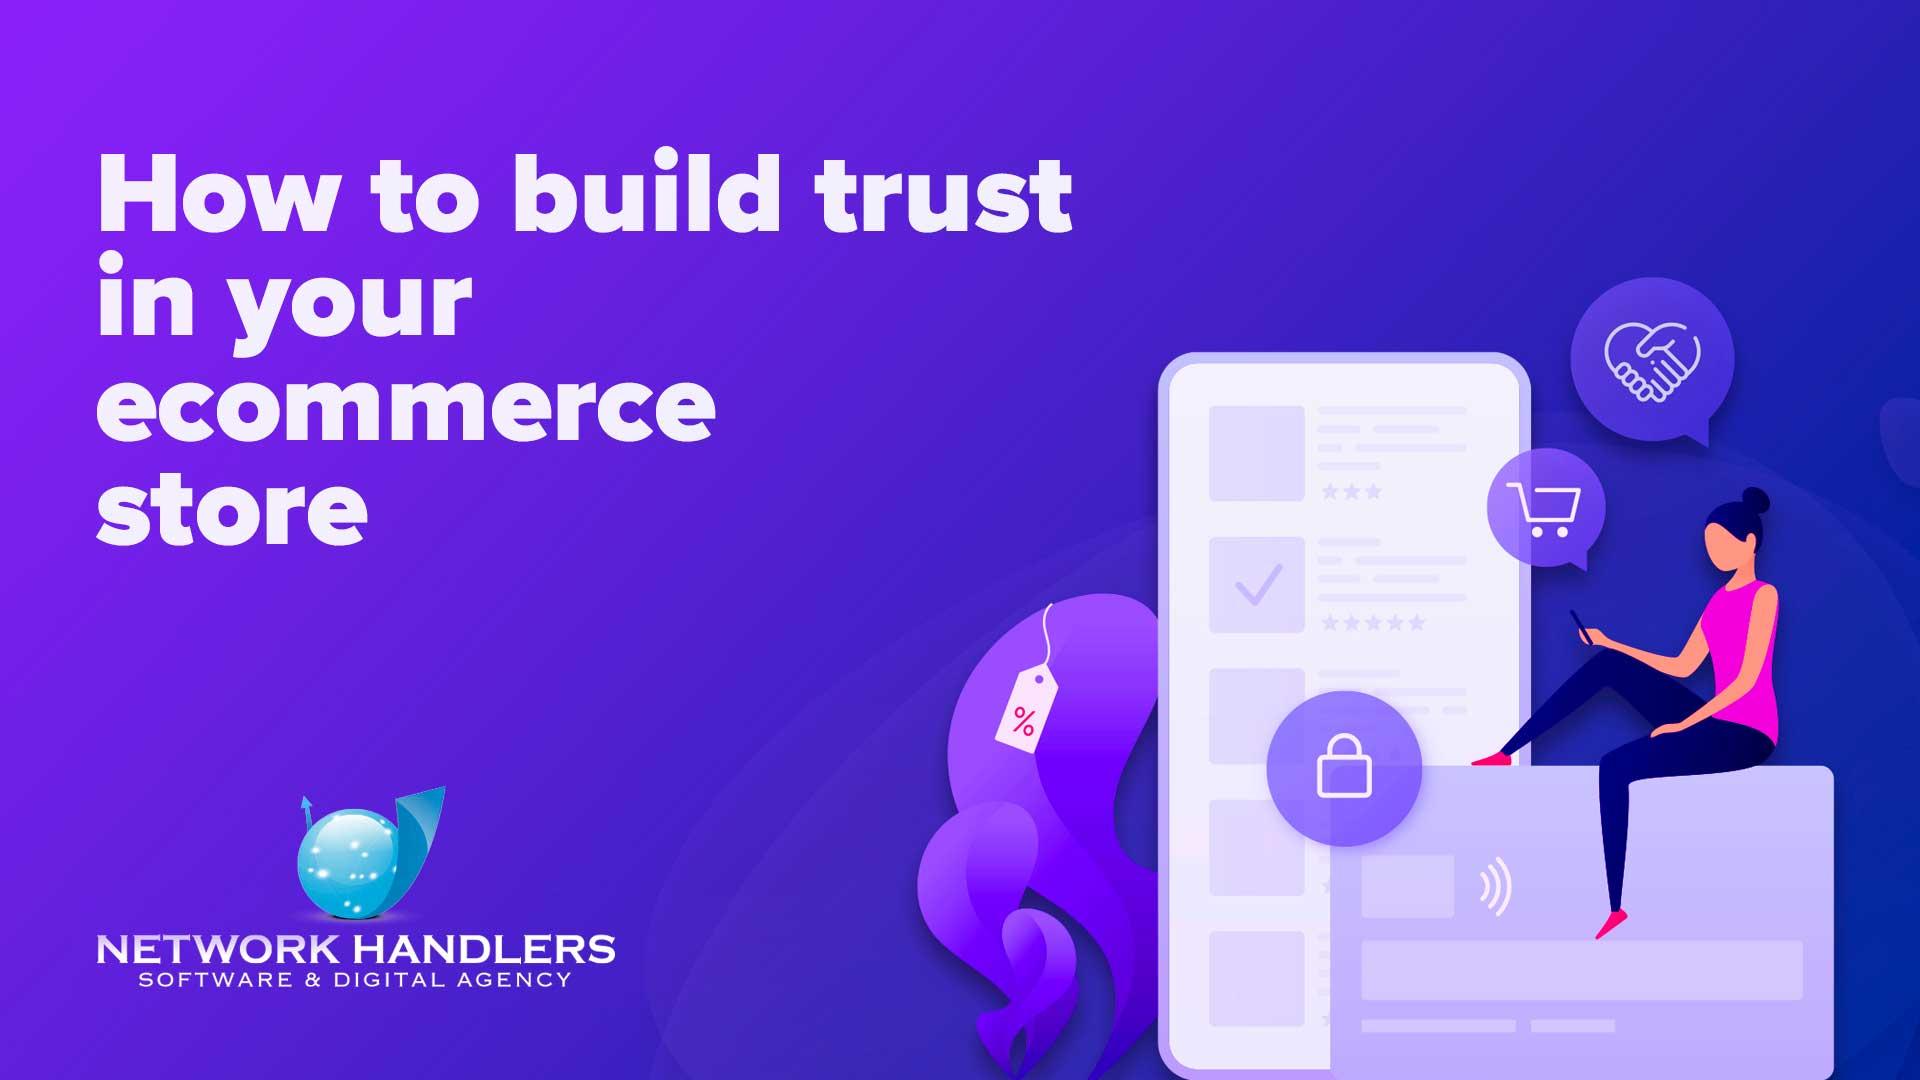 The SEO E-commerce Business Trust